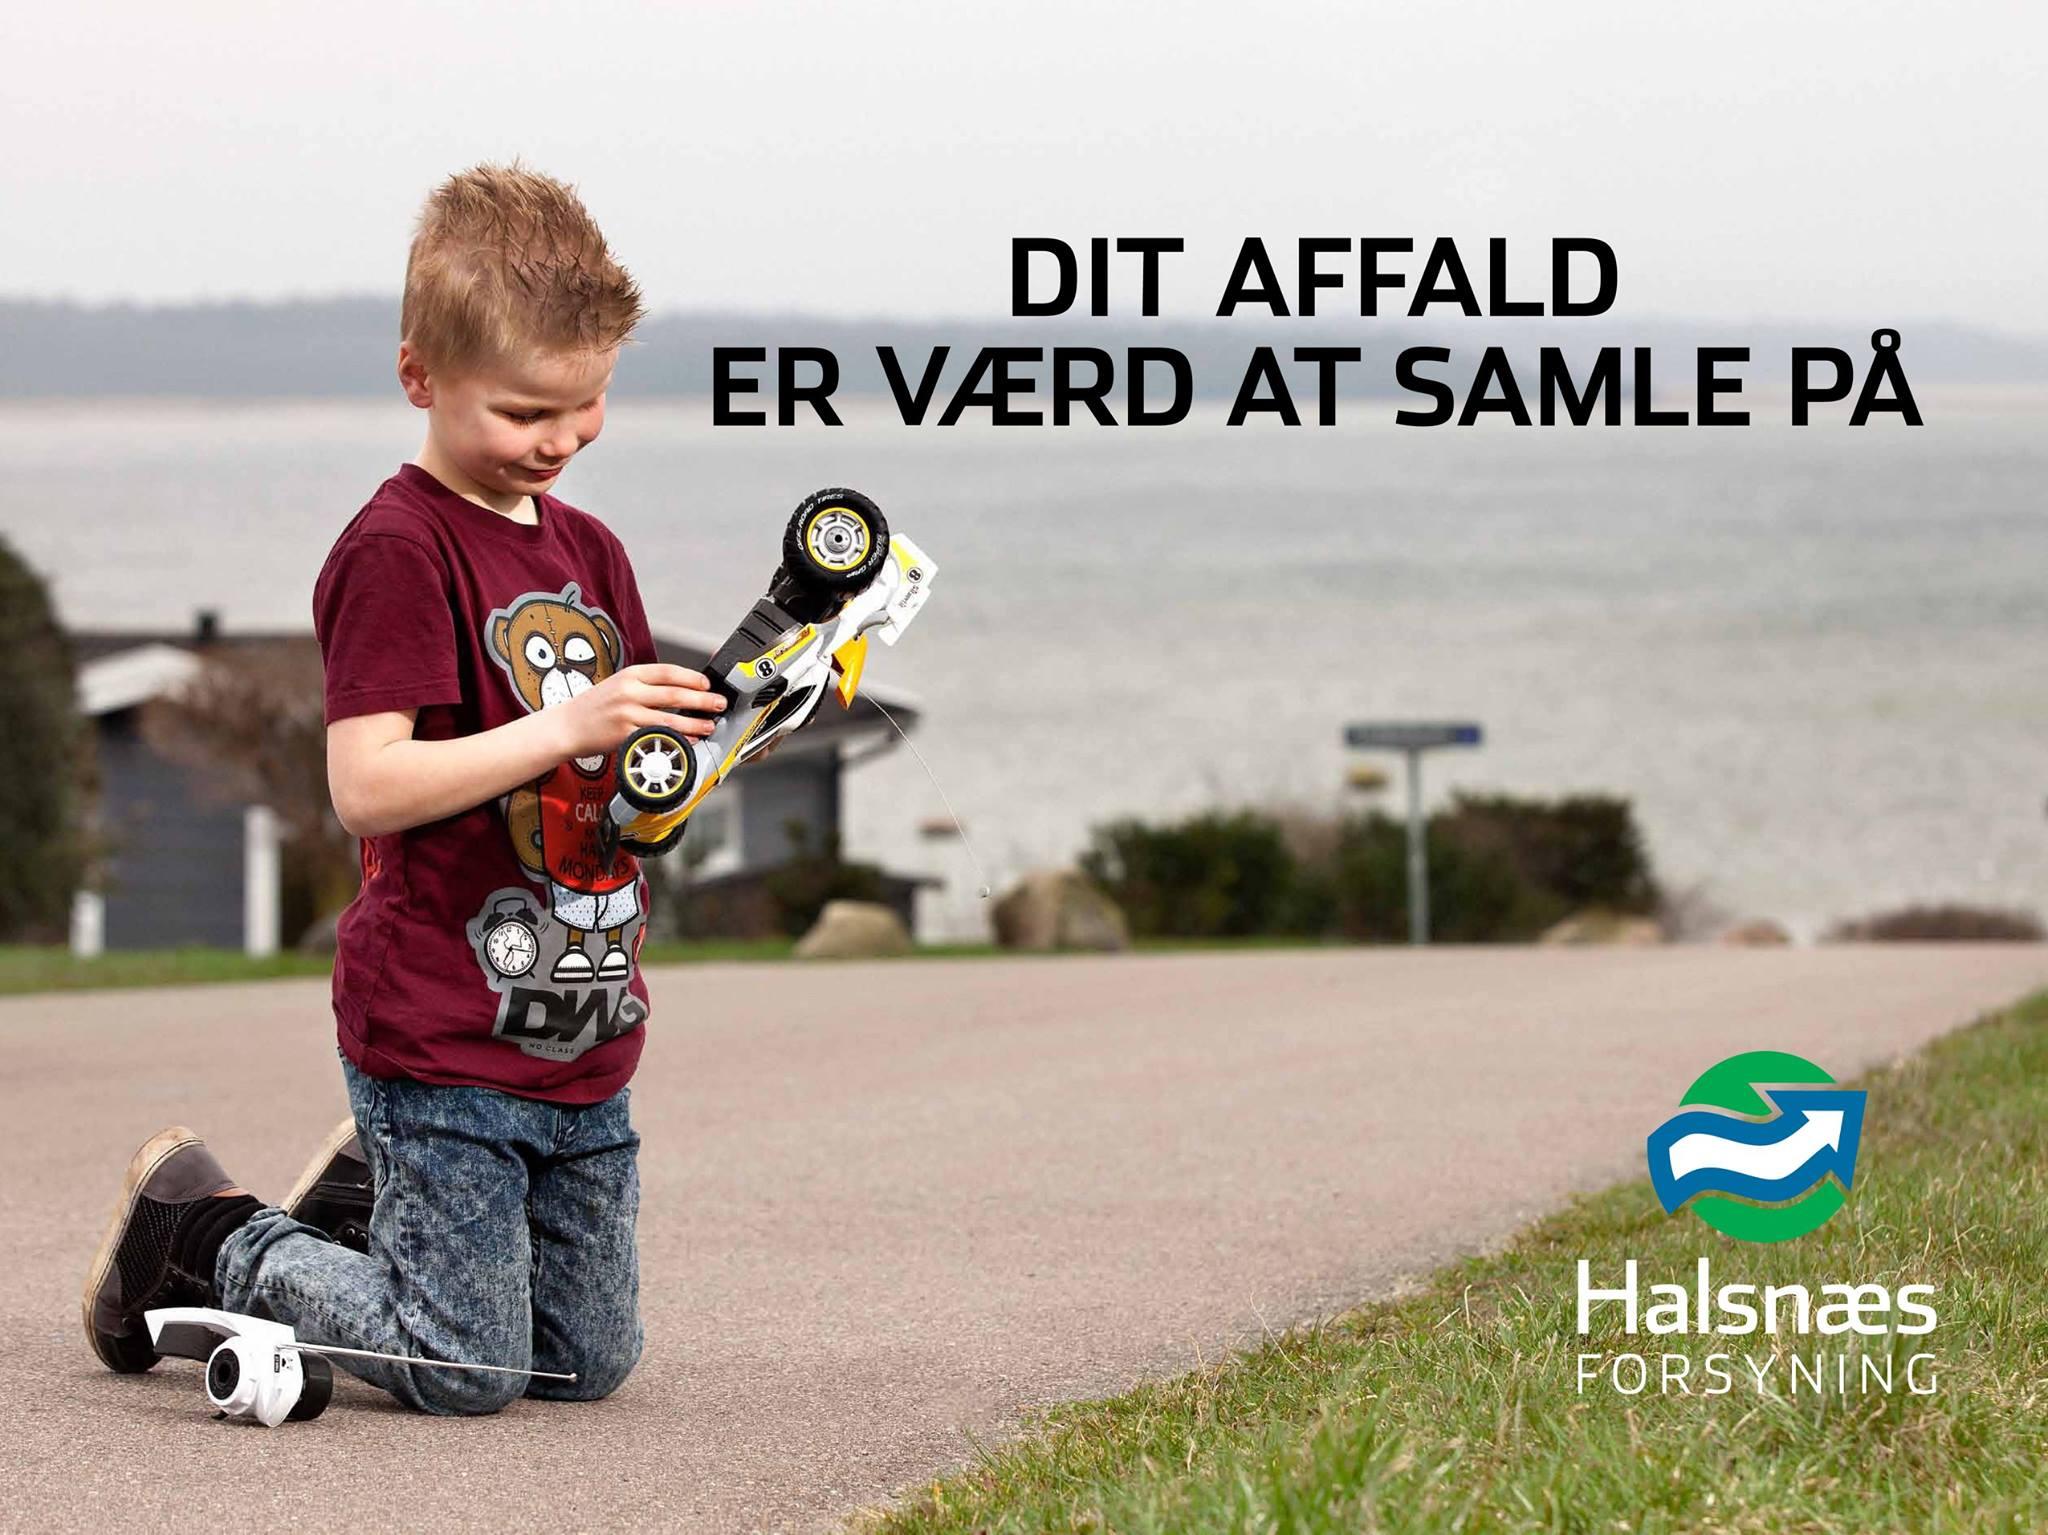 Halsnæs Forsyning får ny kampagne | 1